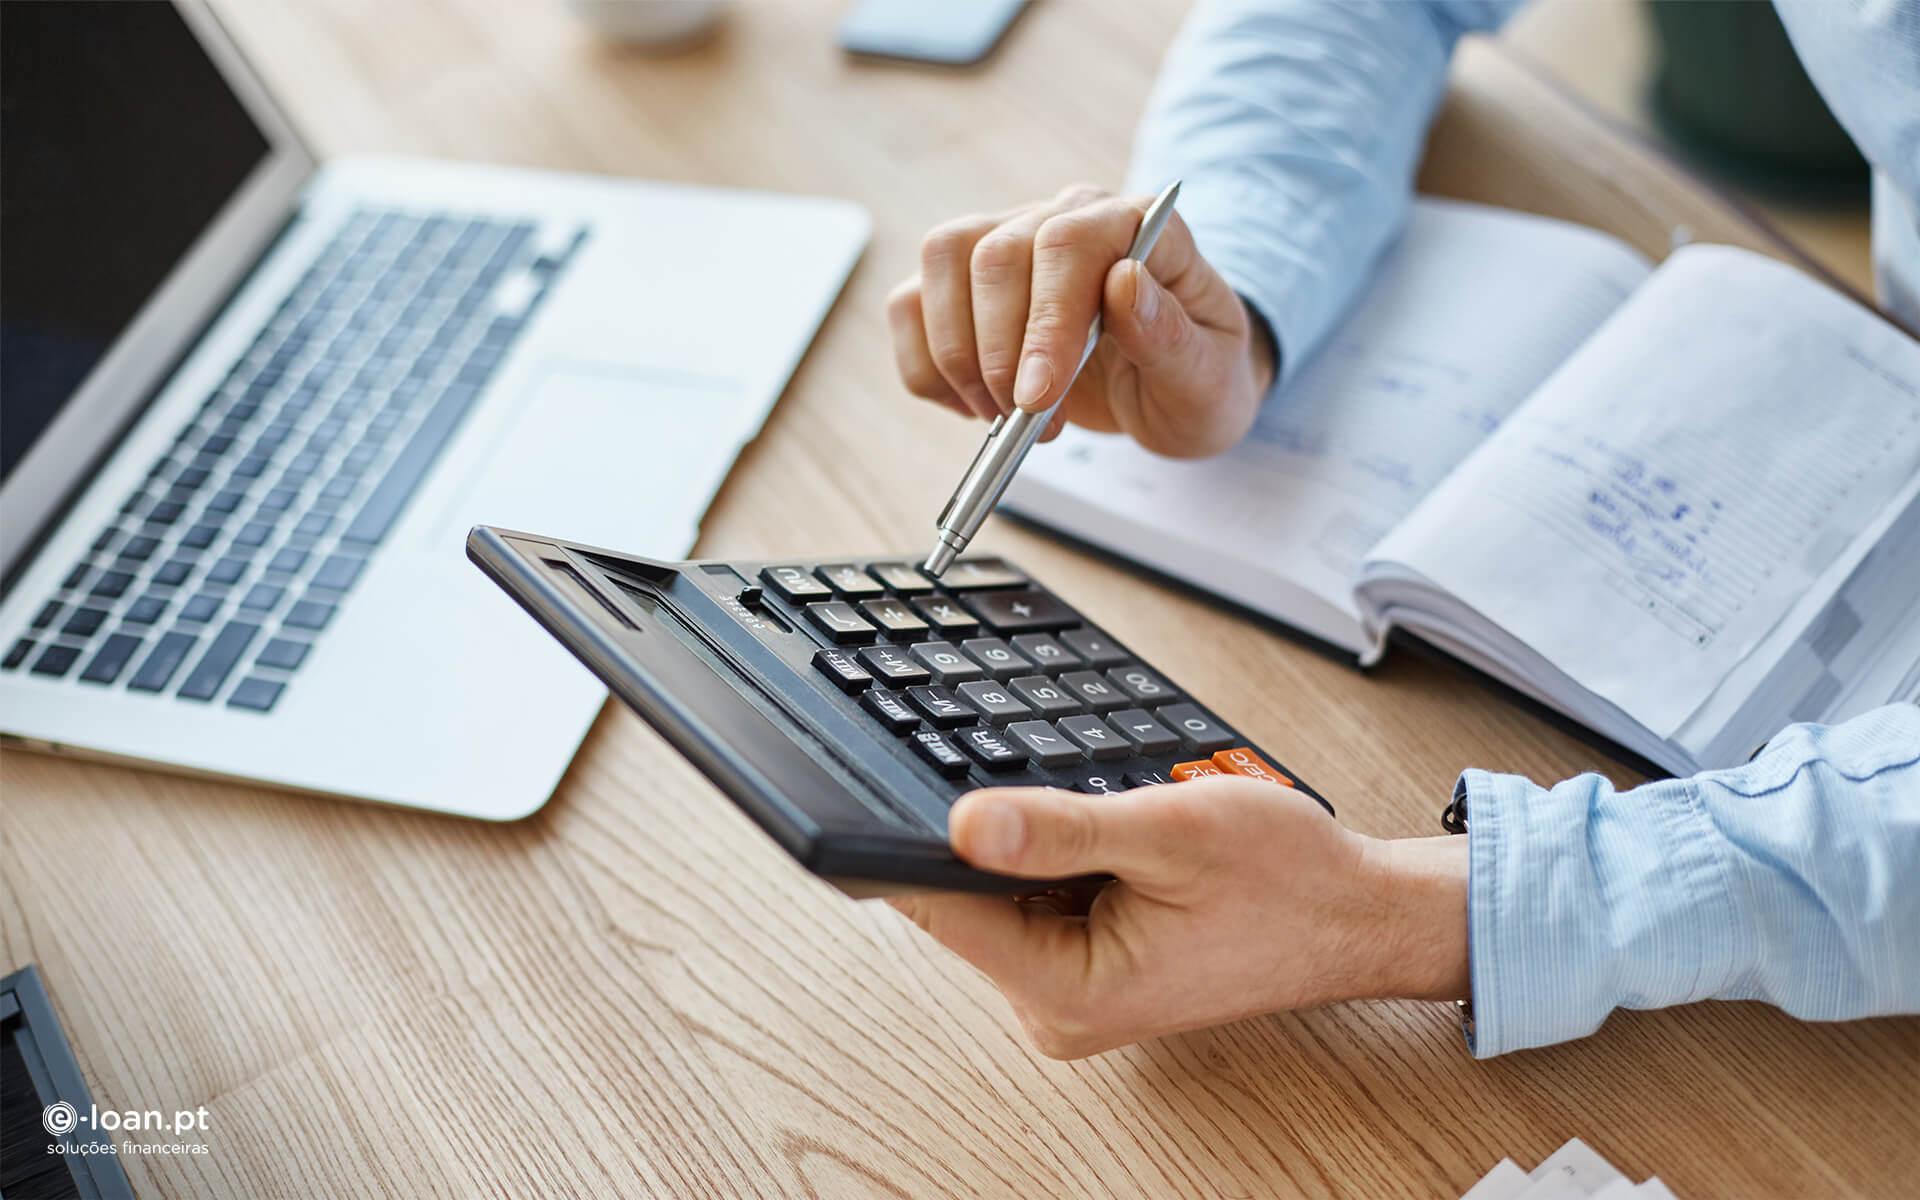 e-loan-solucoes-financeiras-lista-negra-banco-portugal-crc